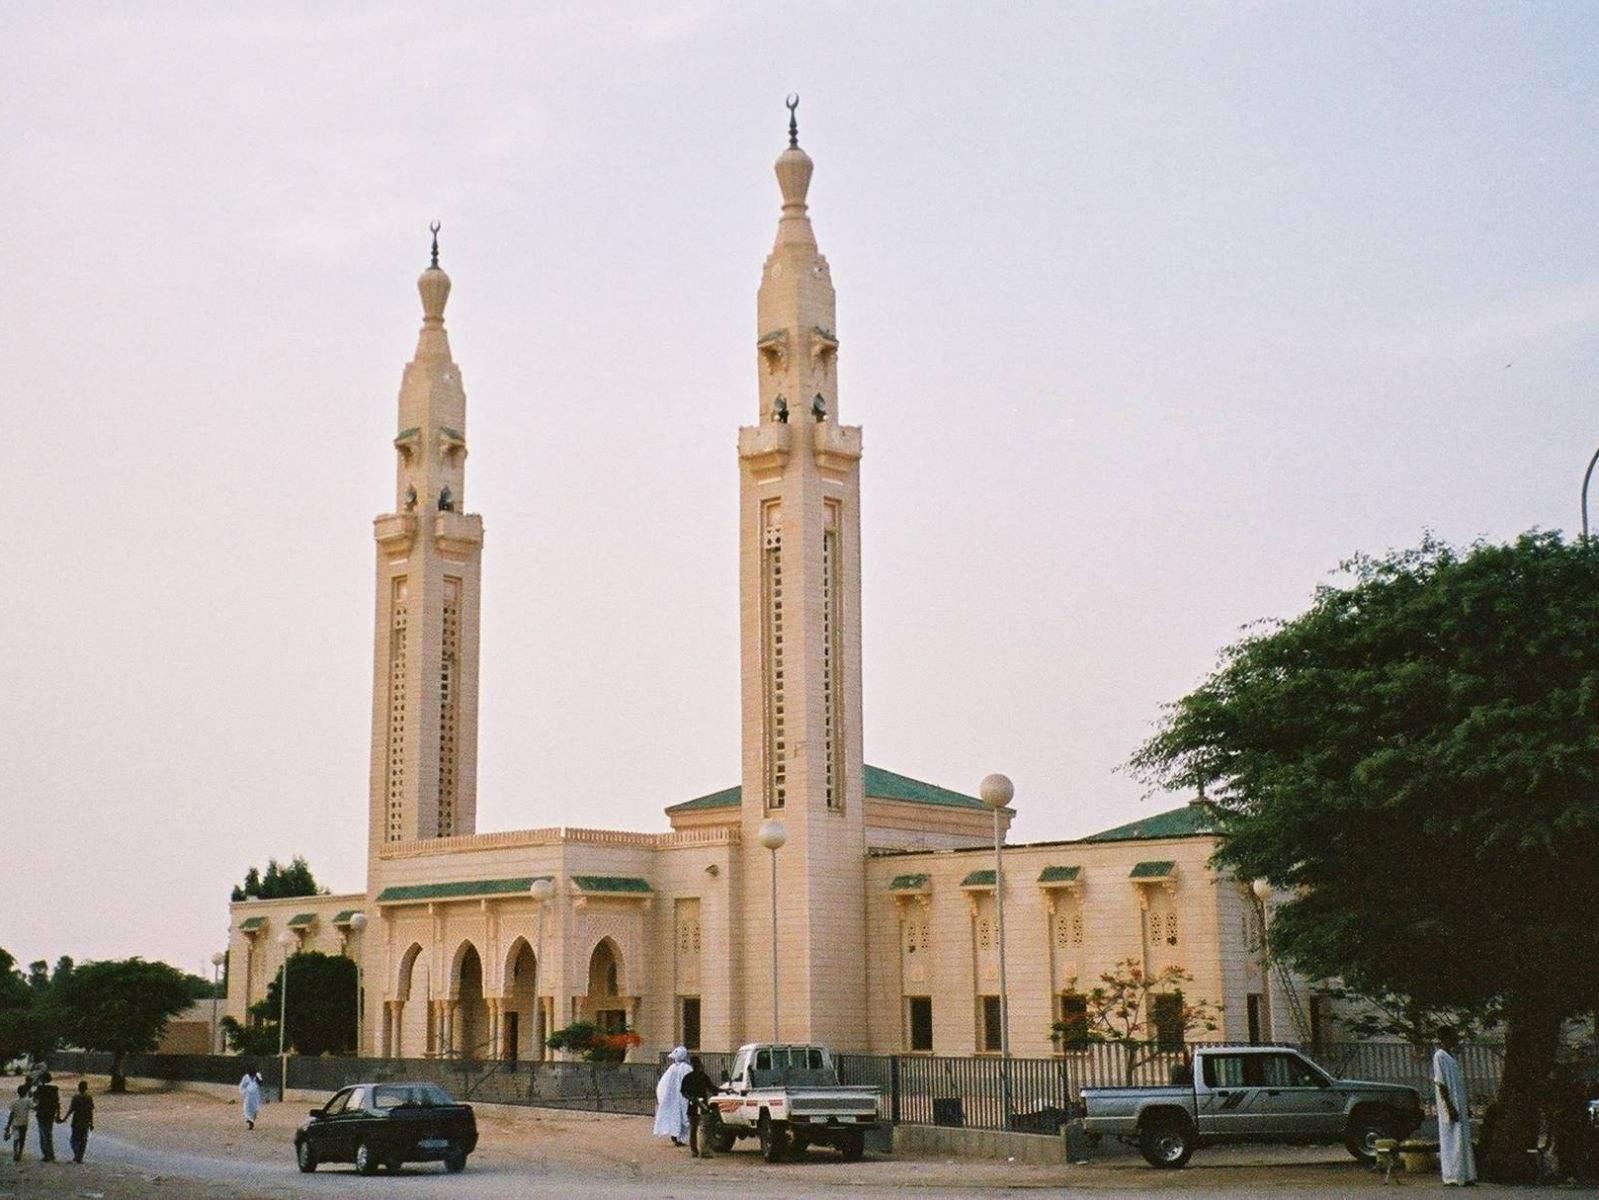 Mauritania,毛里塔尼亚,essay代写,作业代写,代写